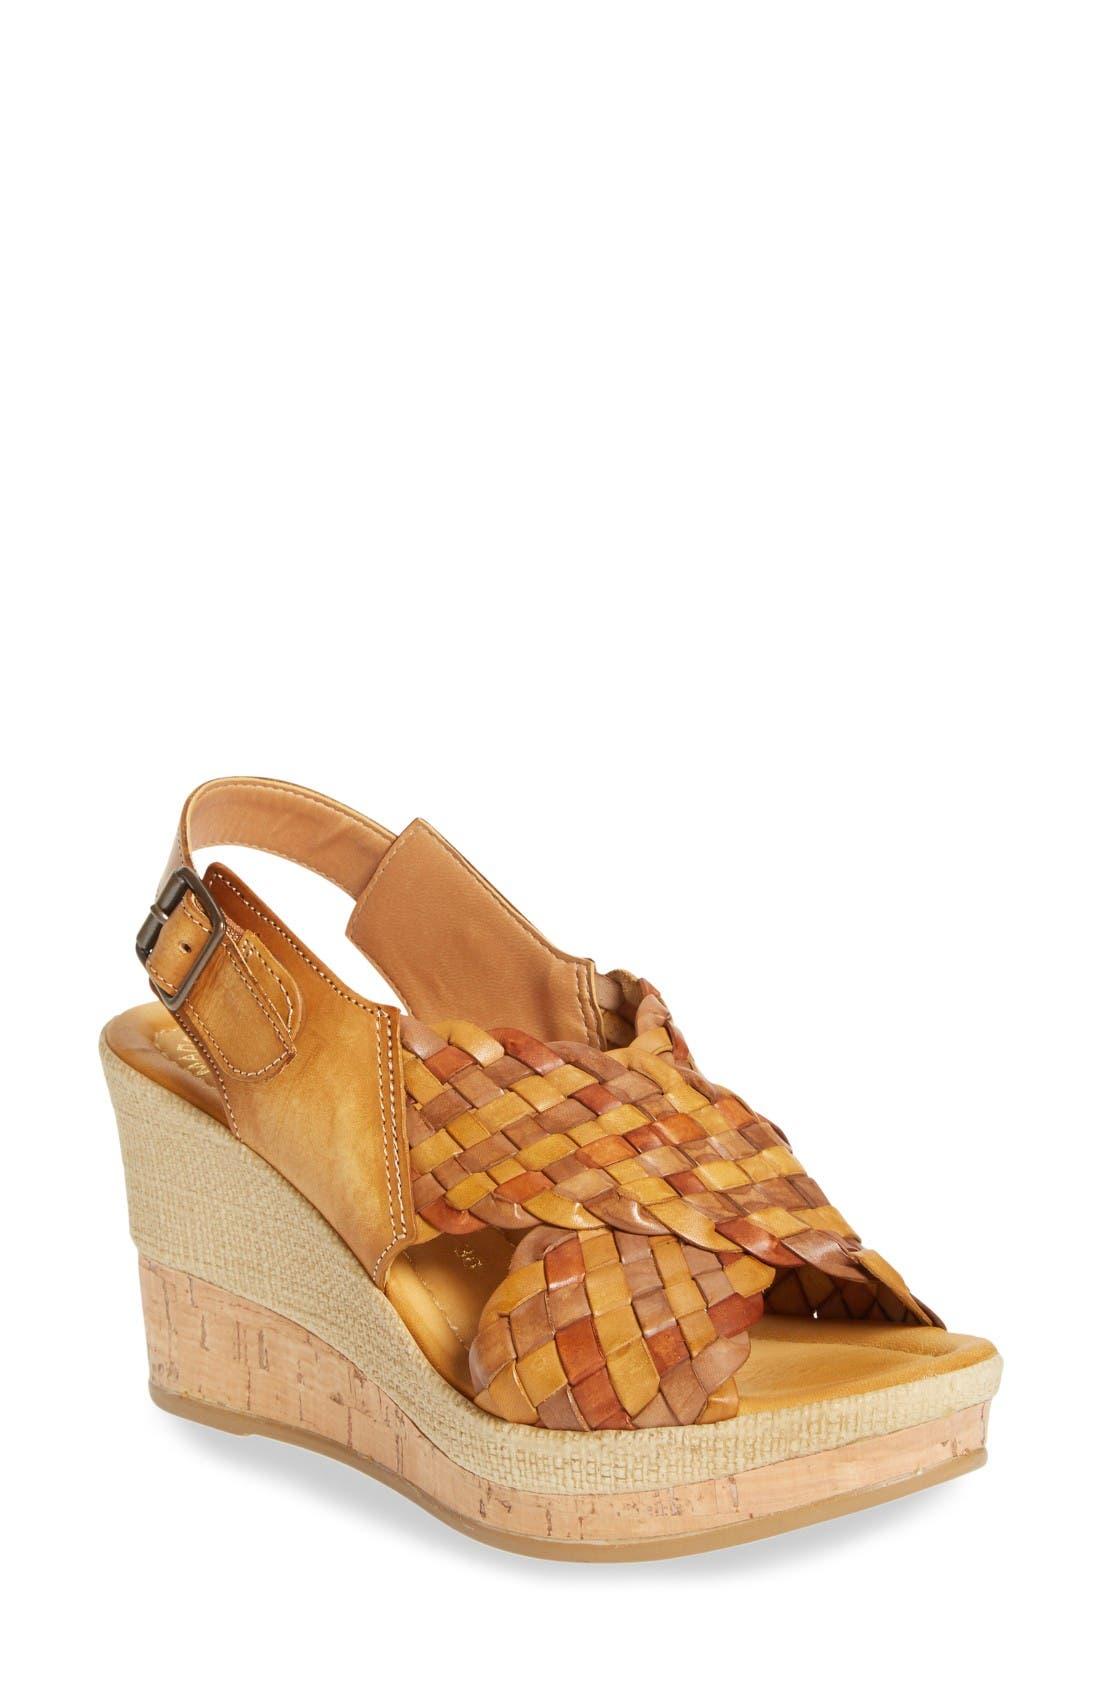 Main Image - Napa Flex Love Wedge Sandal (Women)